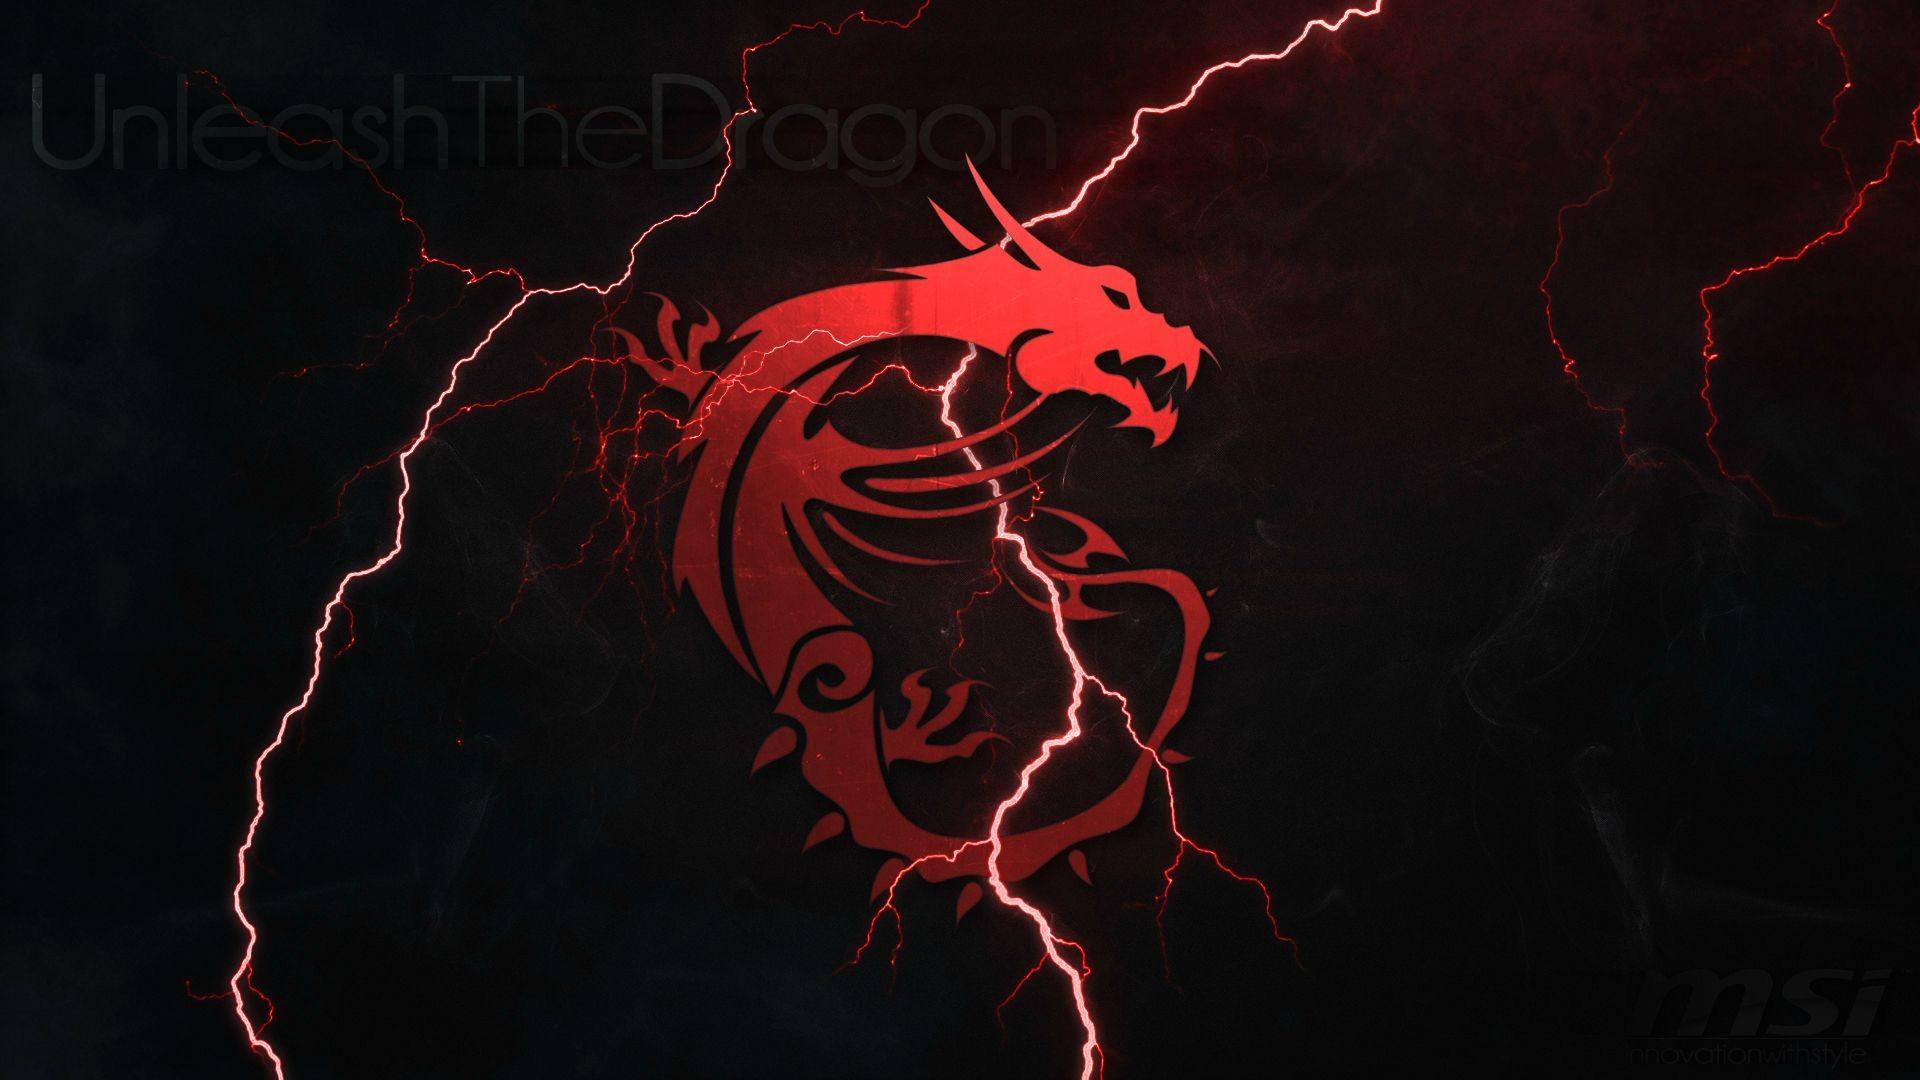 Dragon Wallpaper Hd 1080p Download Free Amazing